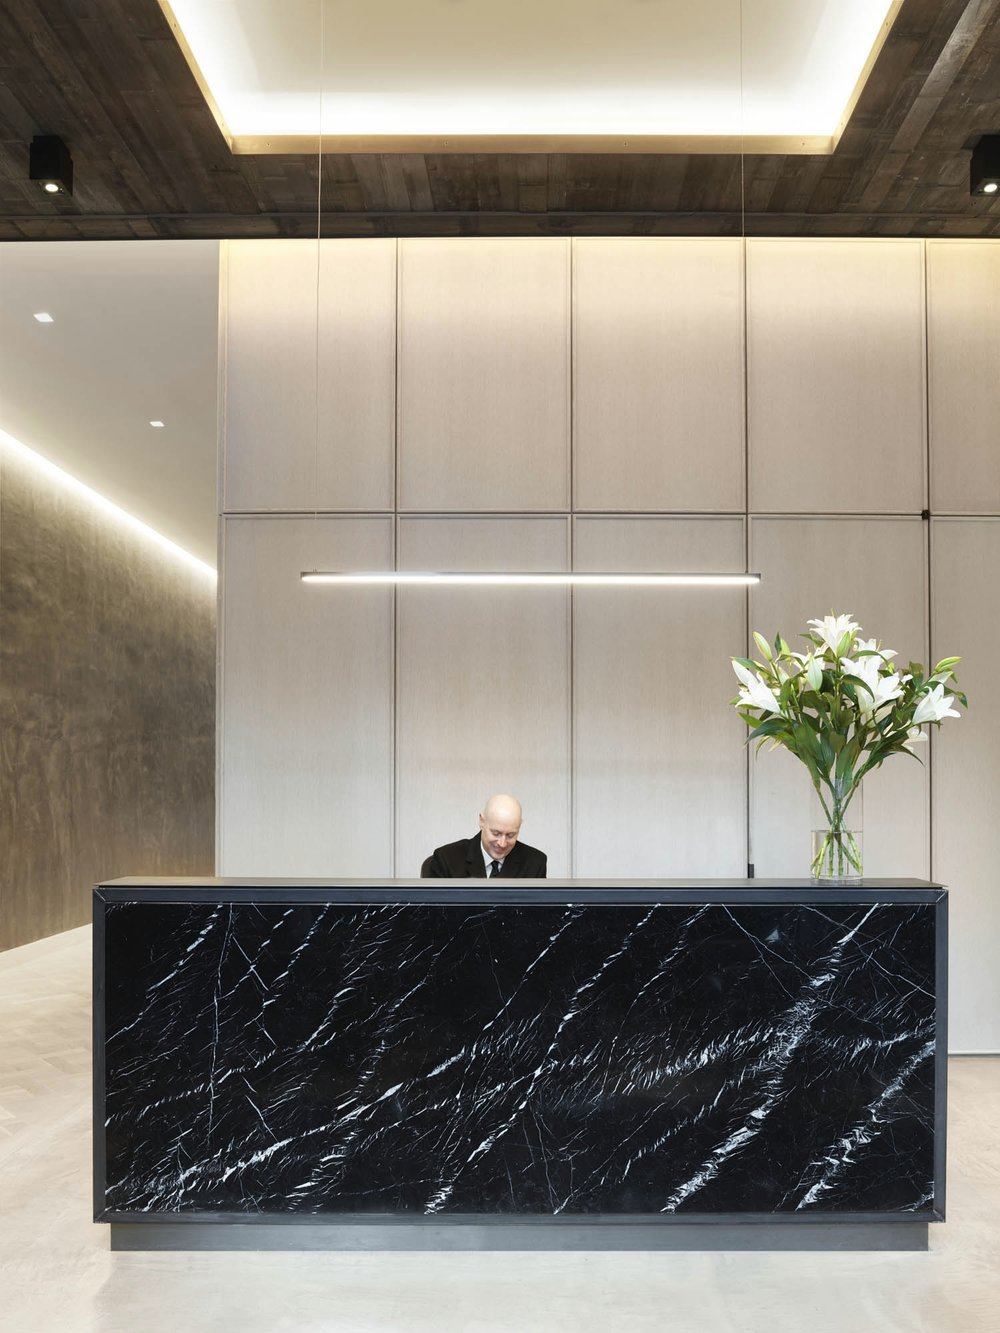 The Sutton Condominium Front Desk and Lobby